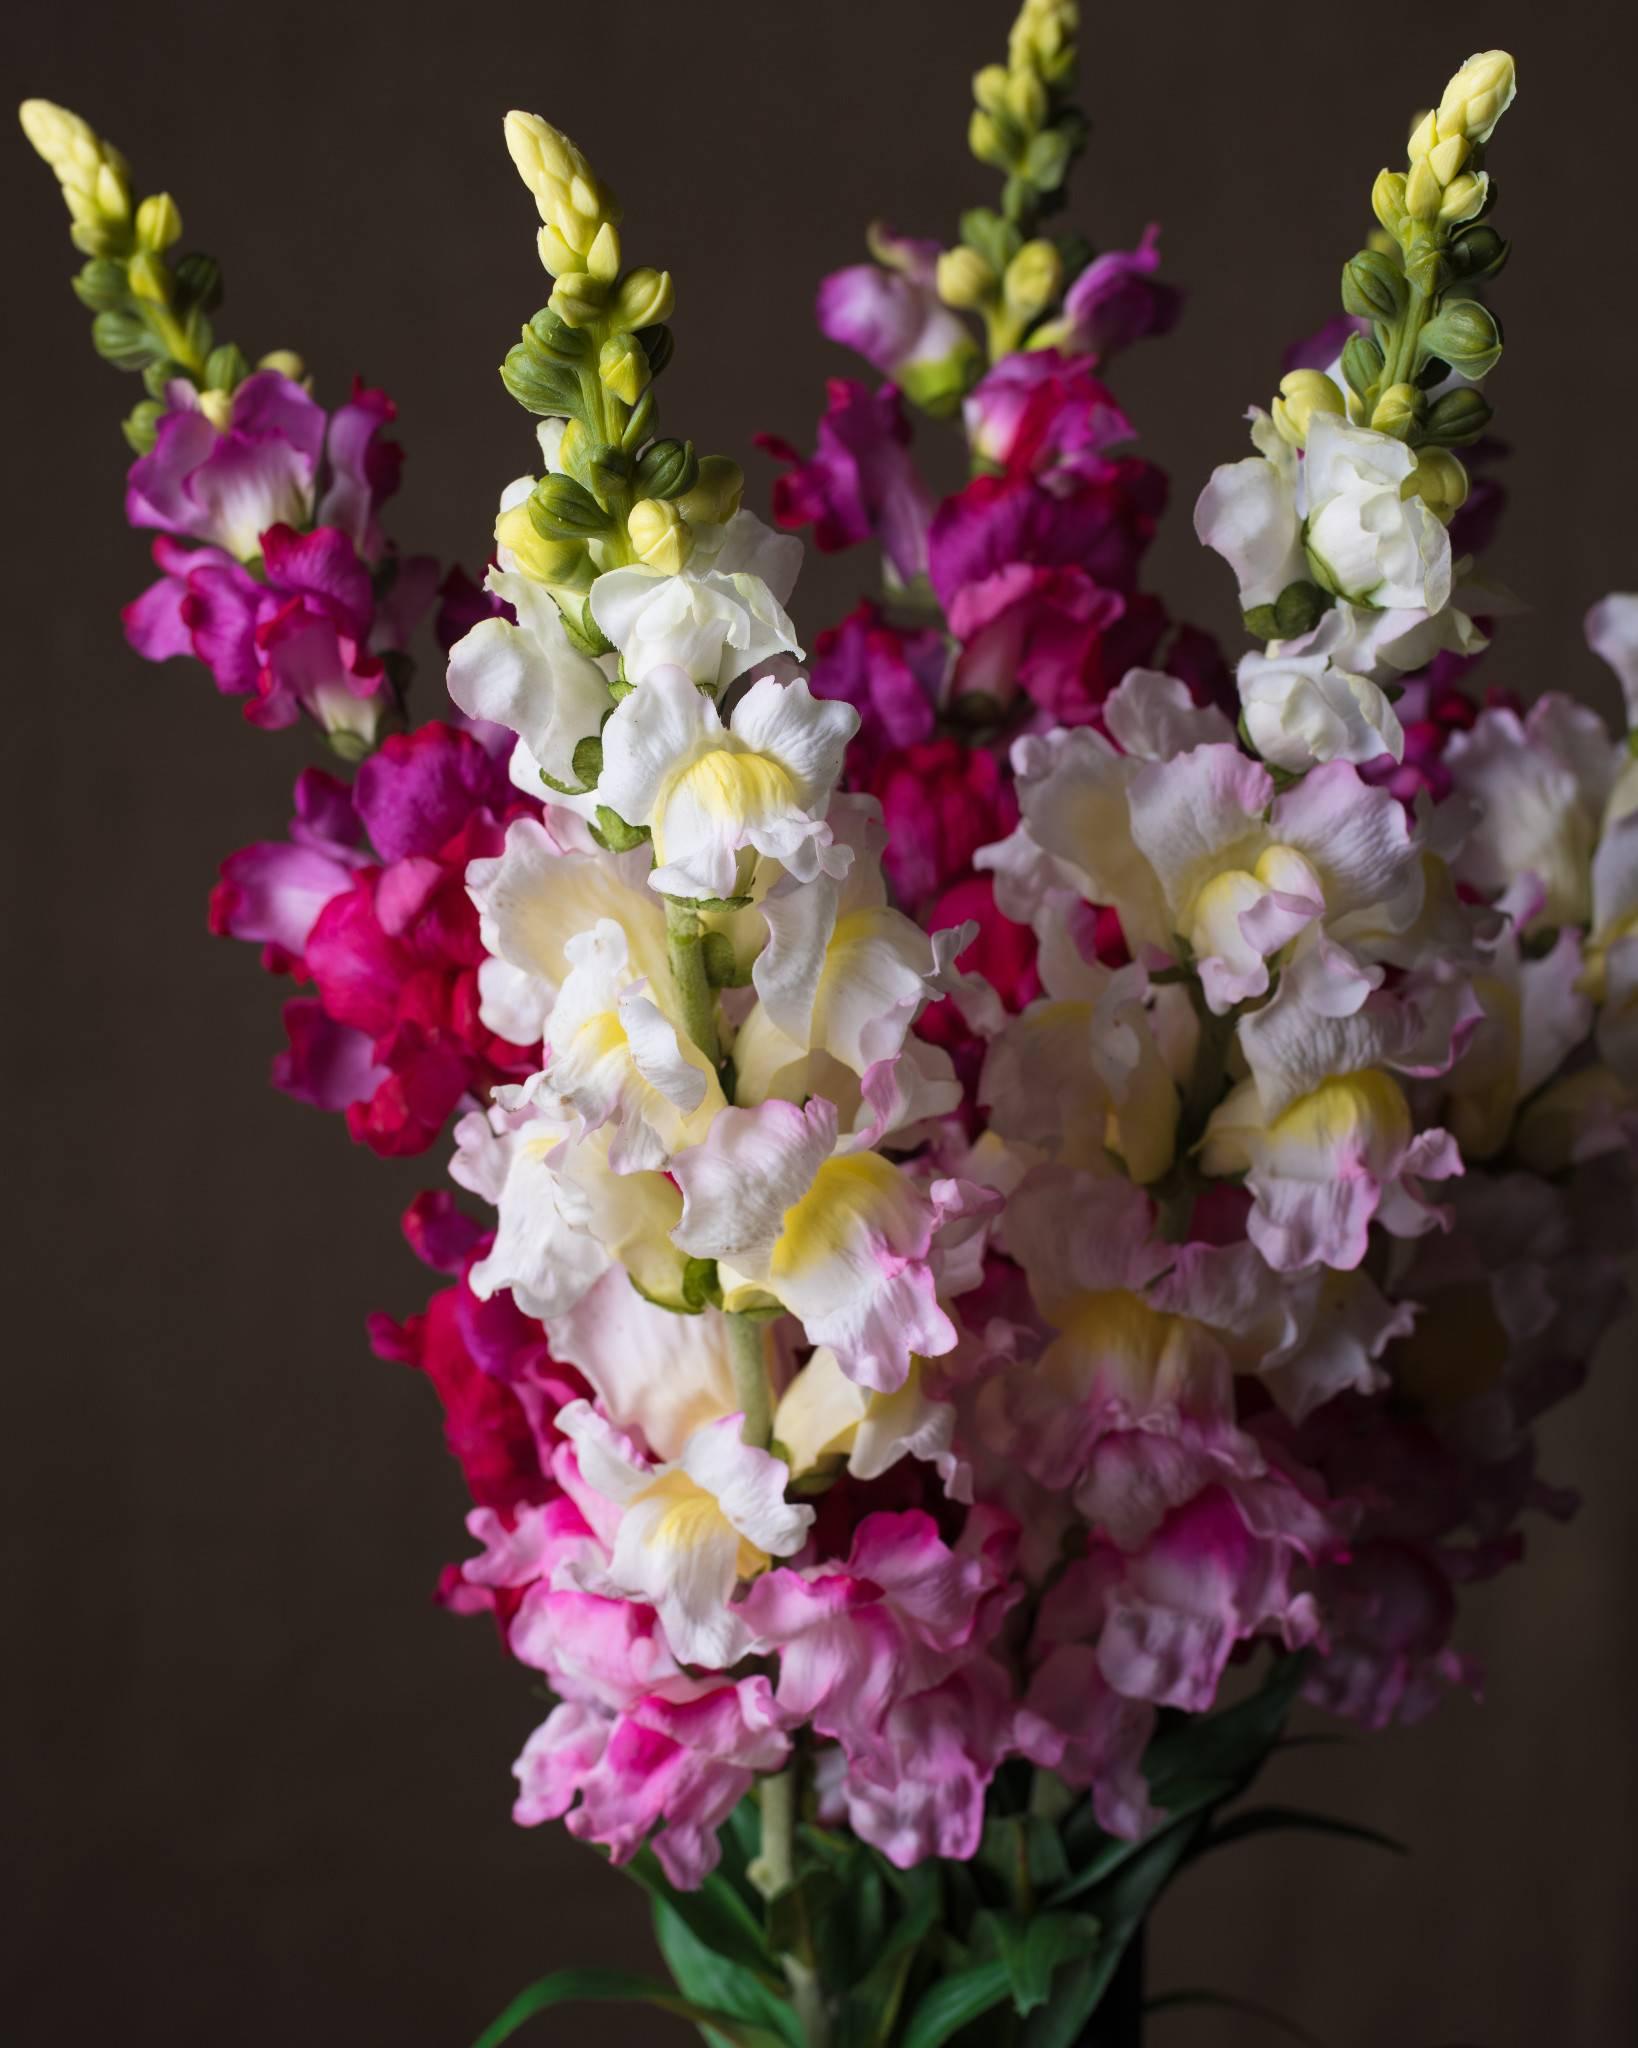 Snapdragon Flower Stems Balsam Hill